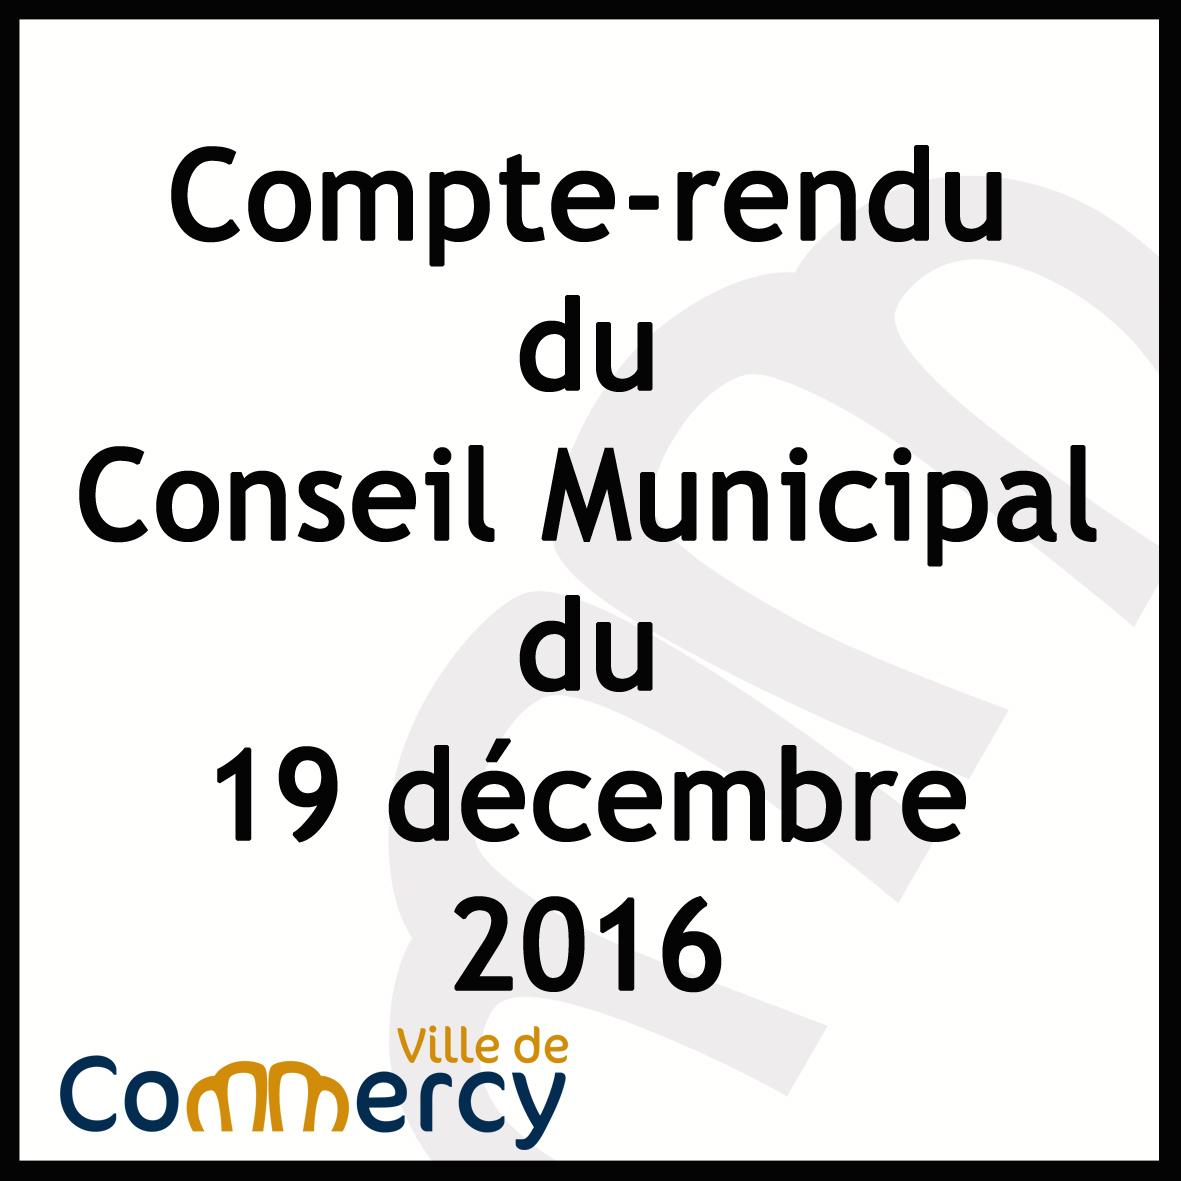 CRCM_20161219